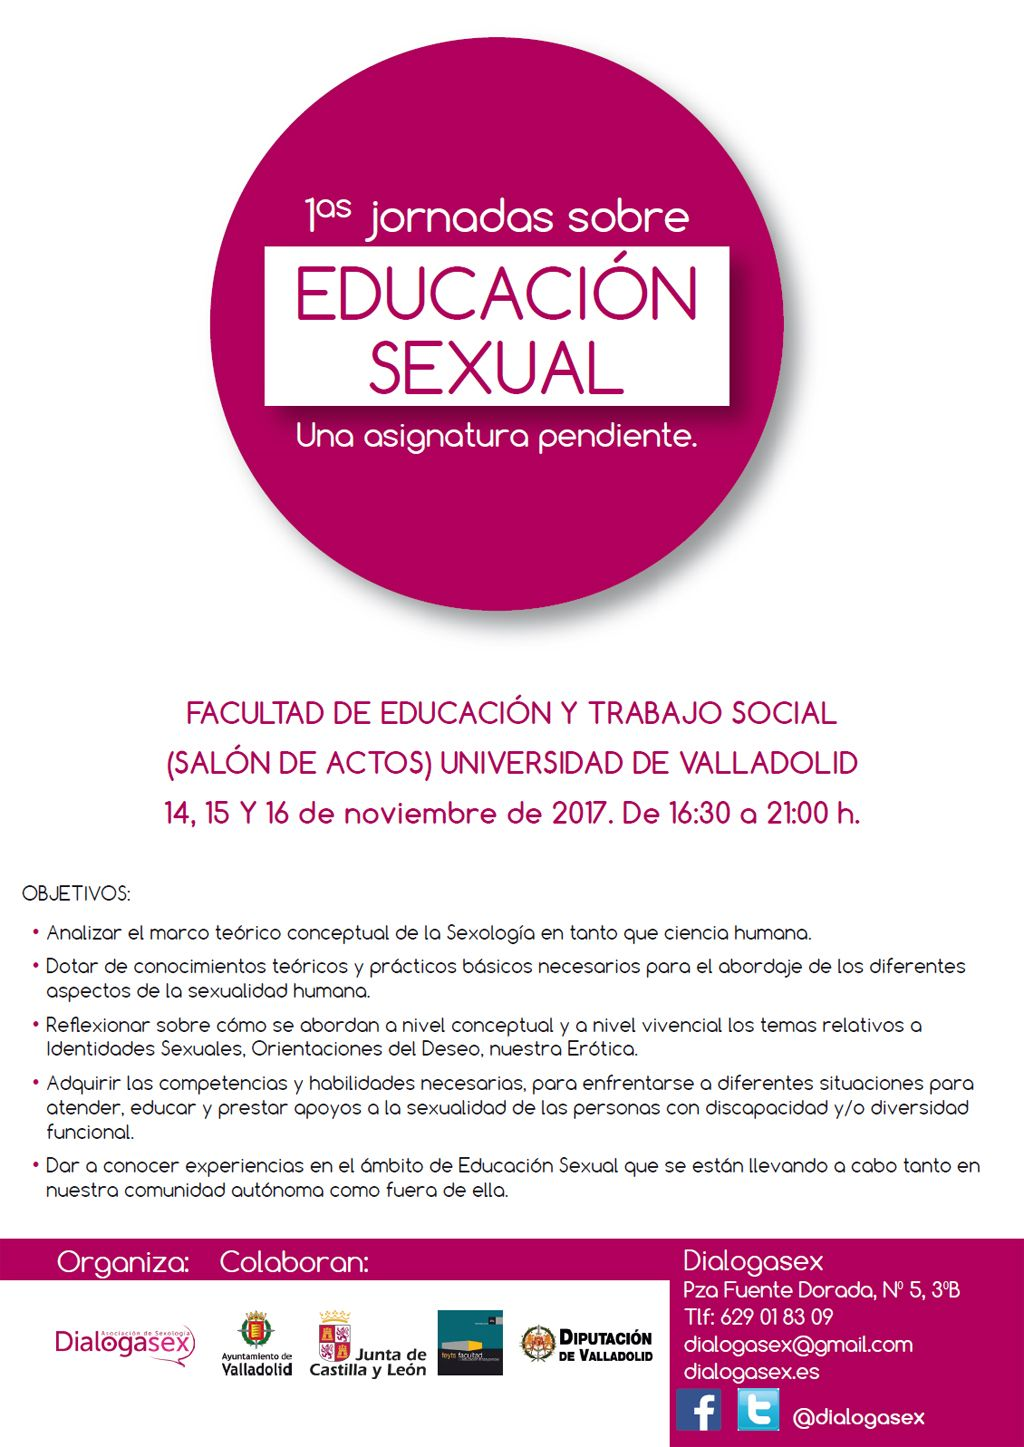 Educacion-Sexual-Jornadas-VA-01